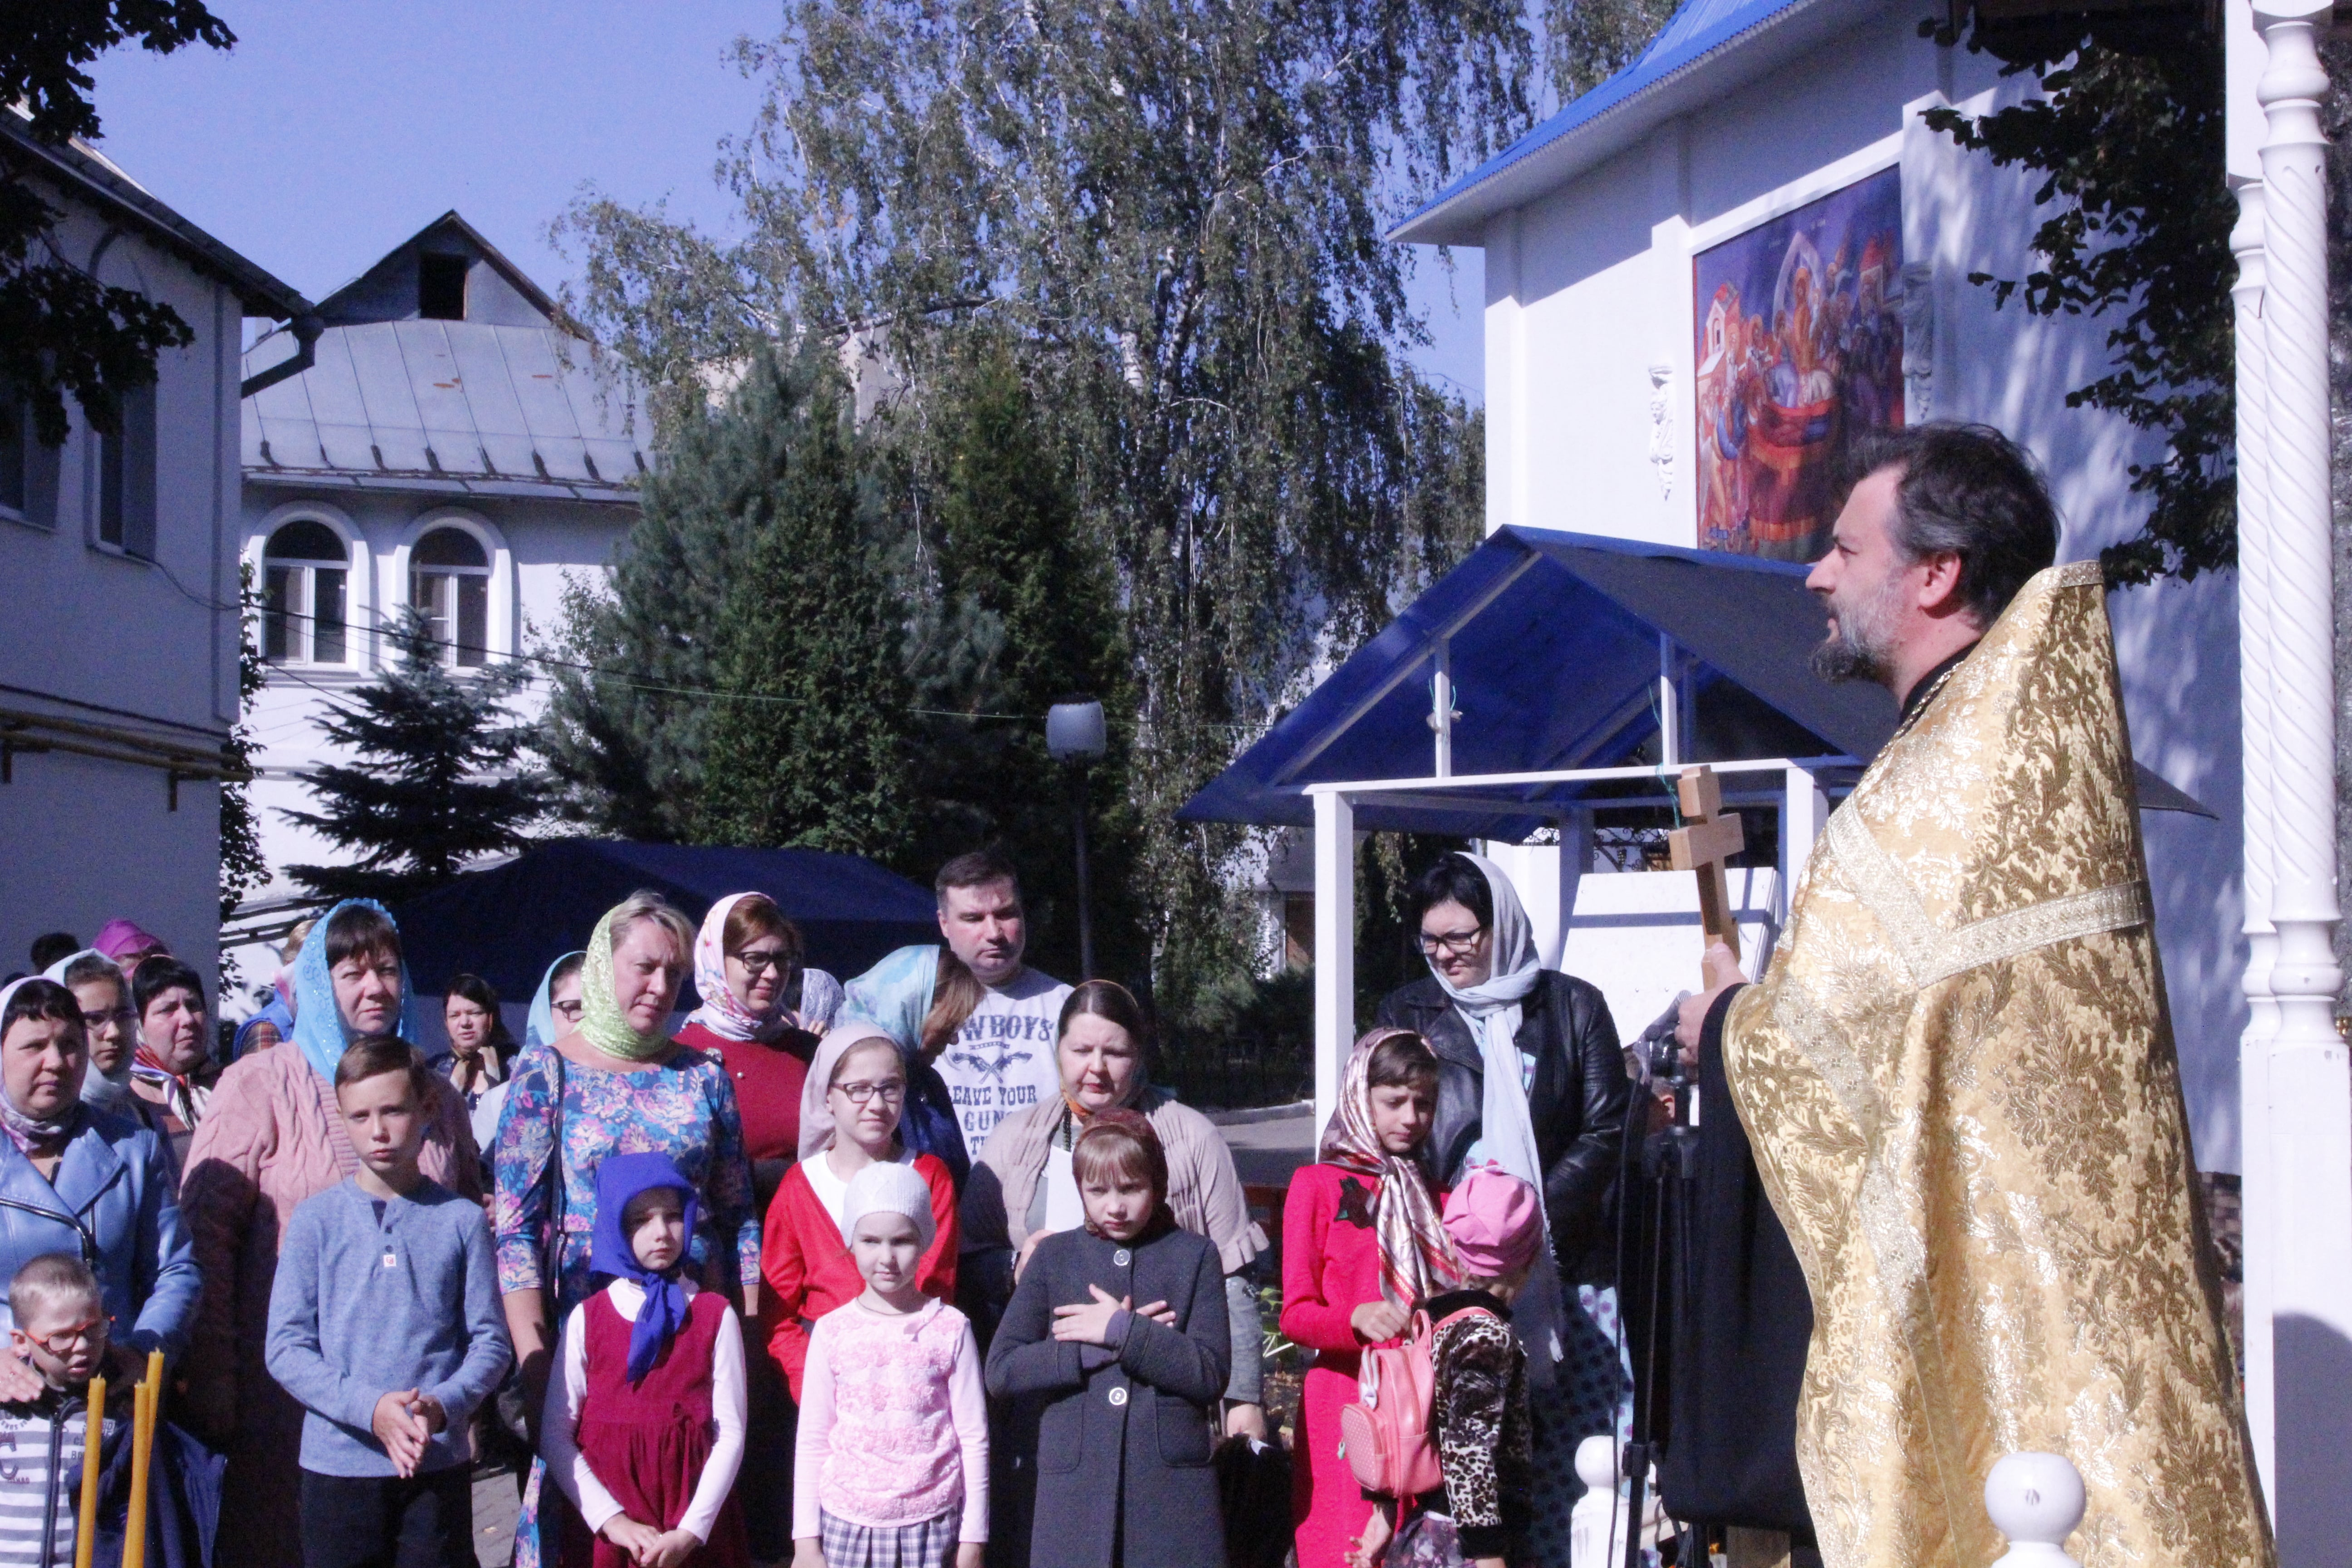 http://monuspen.ru/photoreports/94a621e80539502c1d003484c2f983dj.JPG